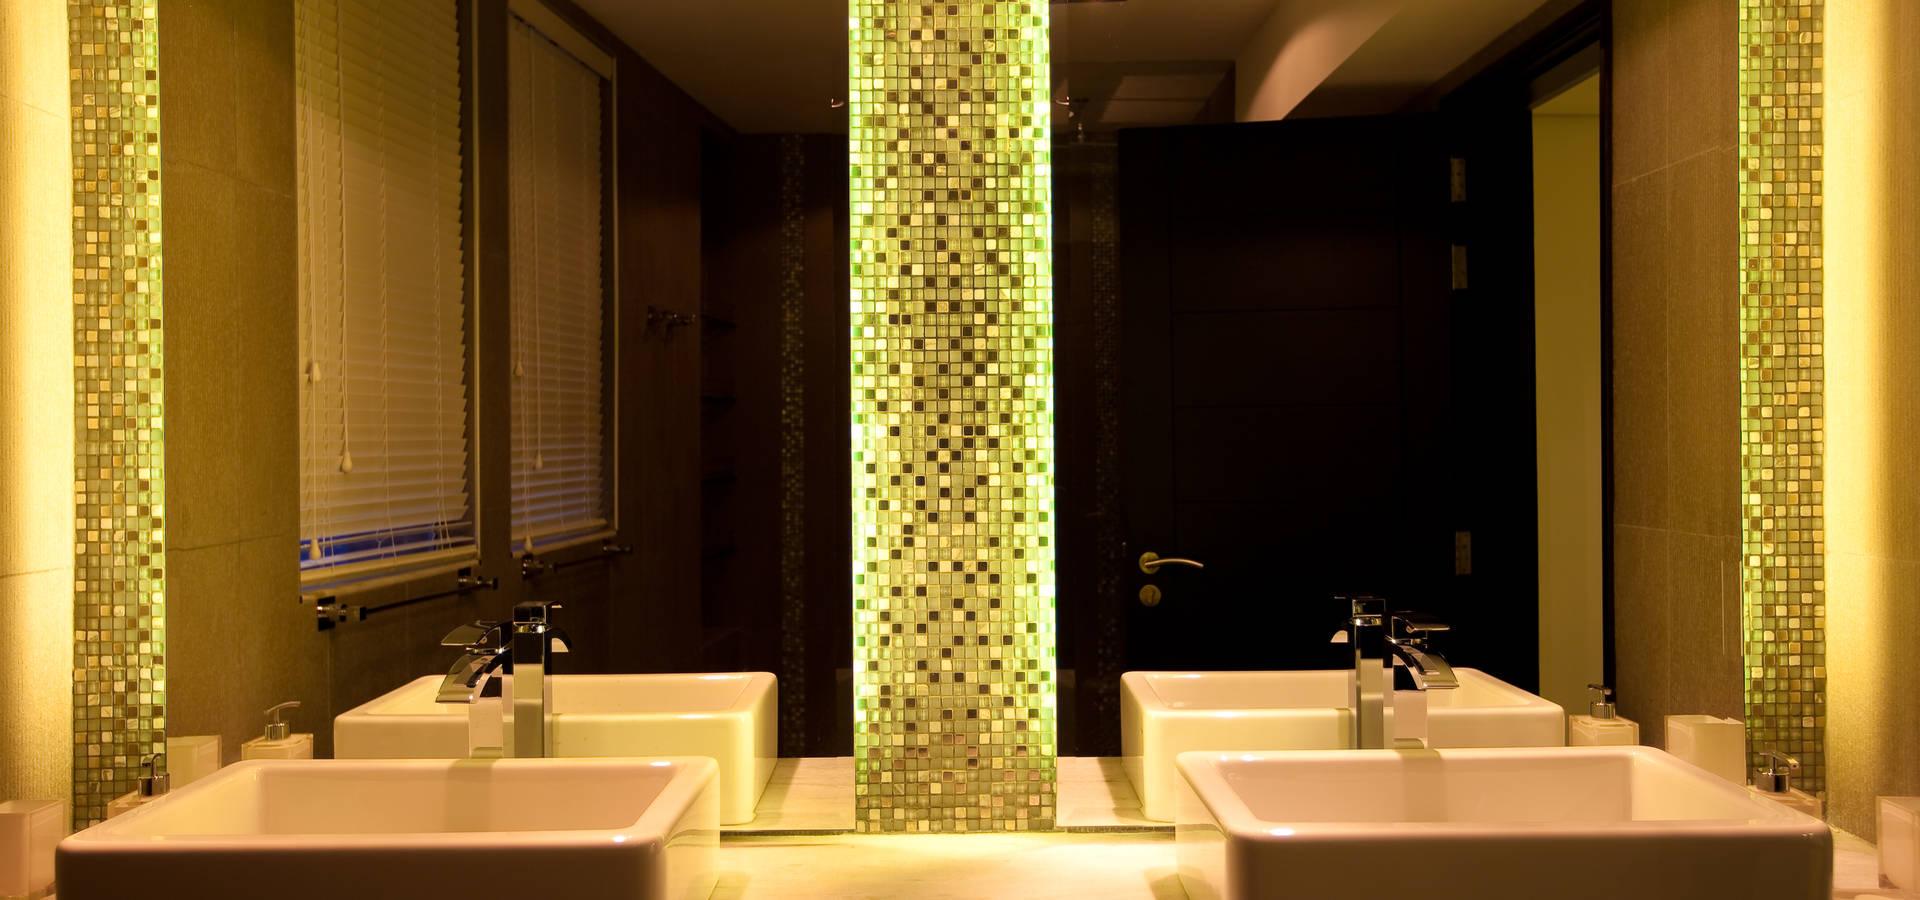 The Silkroad Interior Design